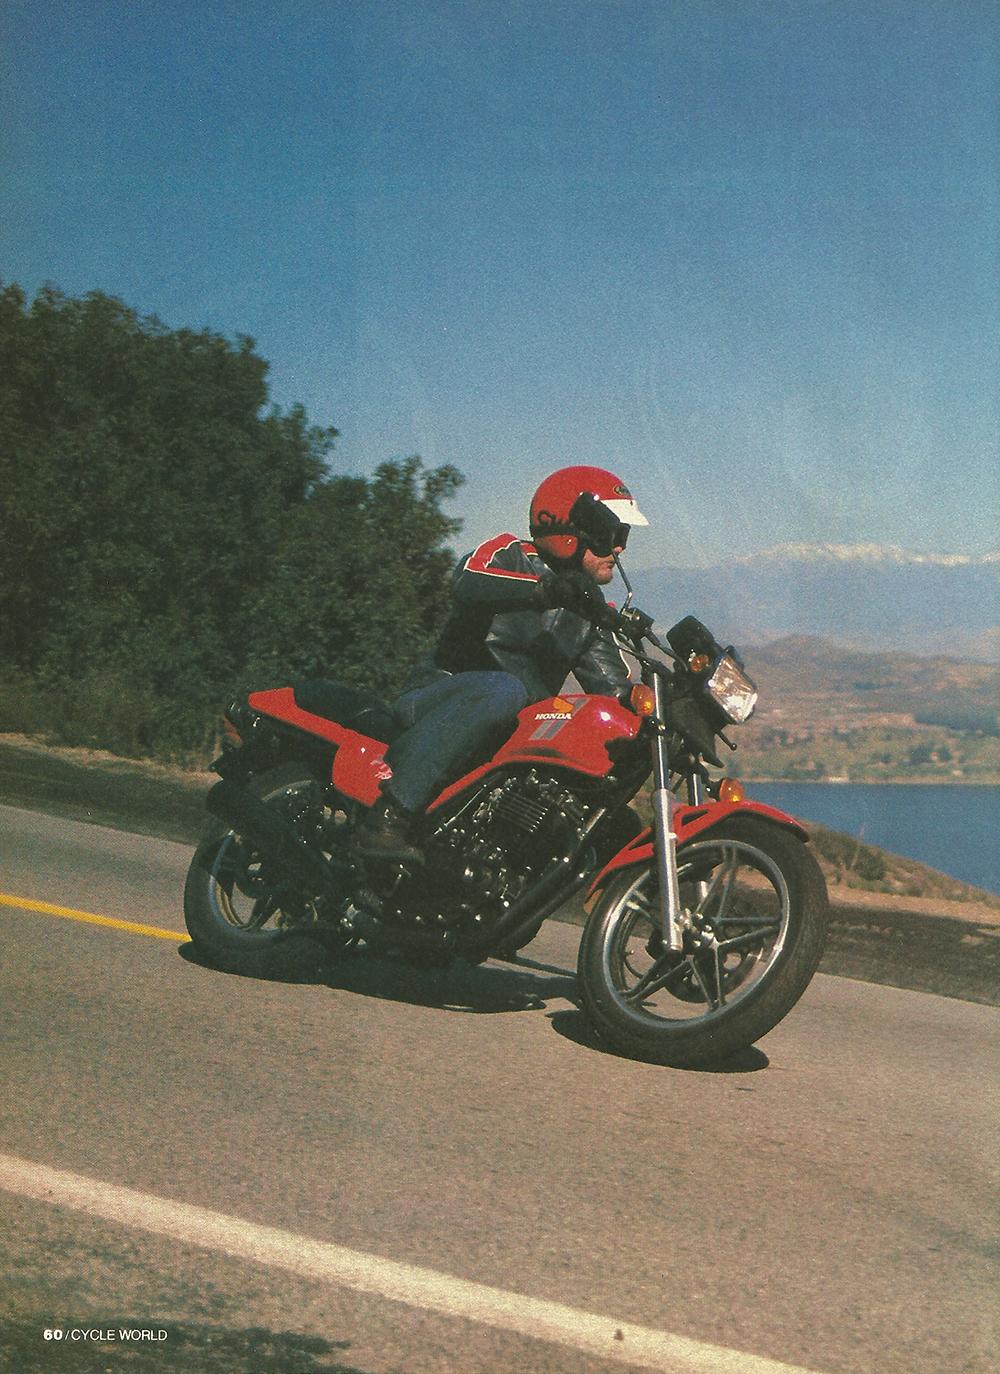 1982 Honda FT500 Ascot road test 01.jpg